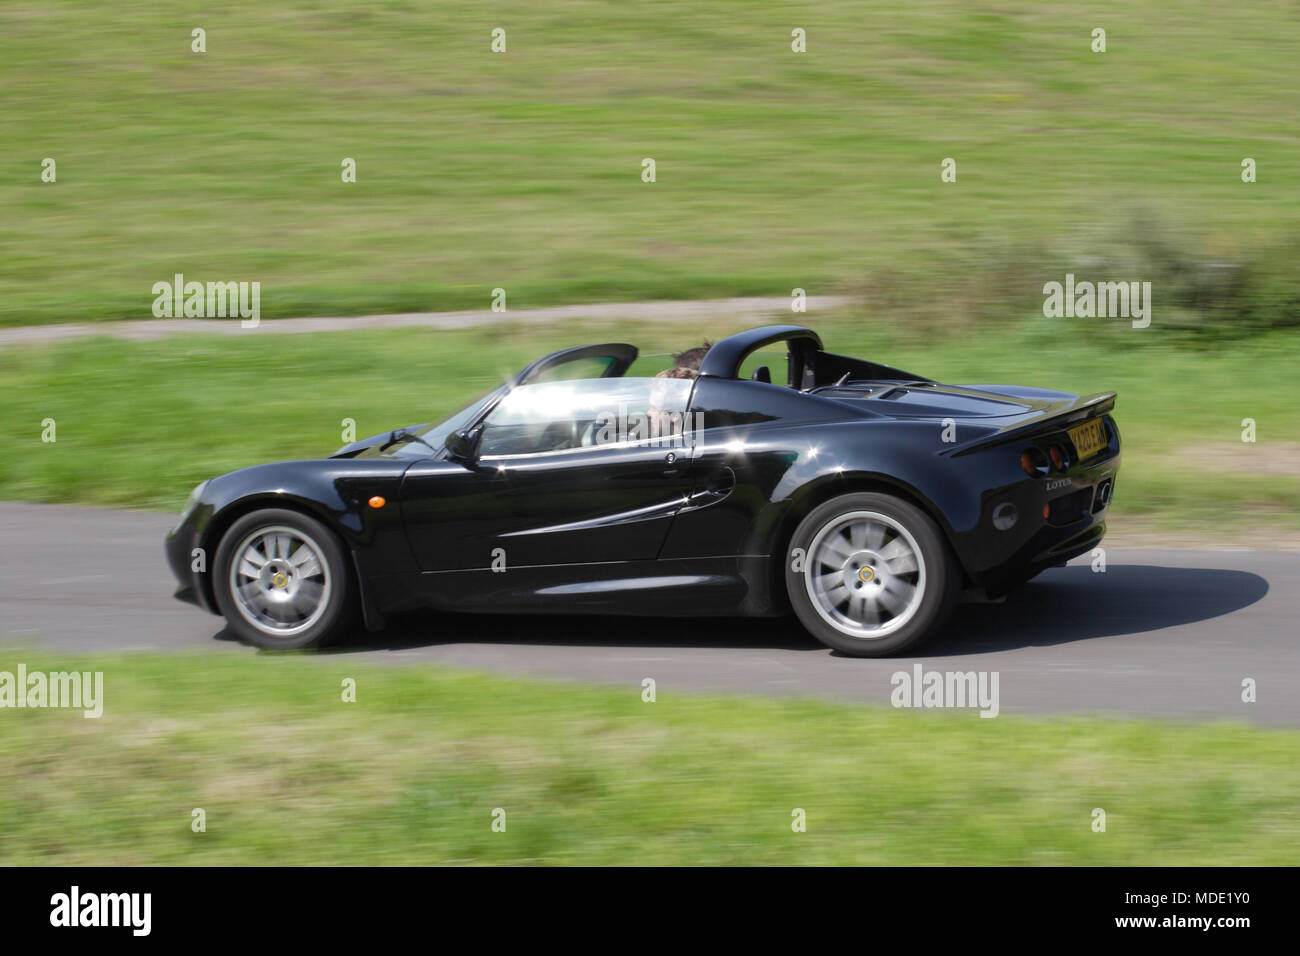 Cars Of The Future Stockfotos & Cars Of The Future Bilder - Alamy